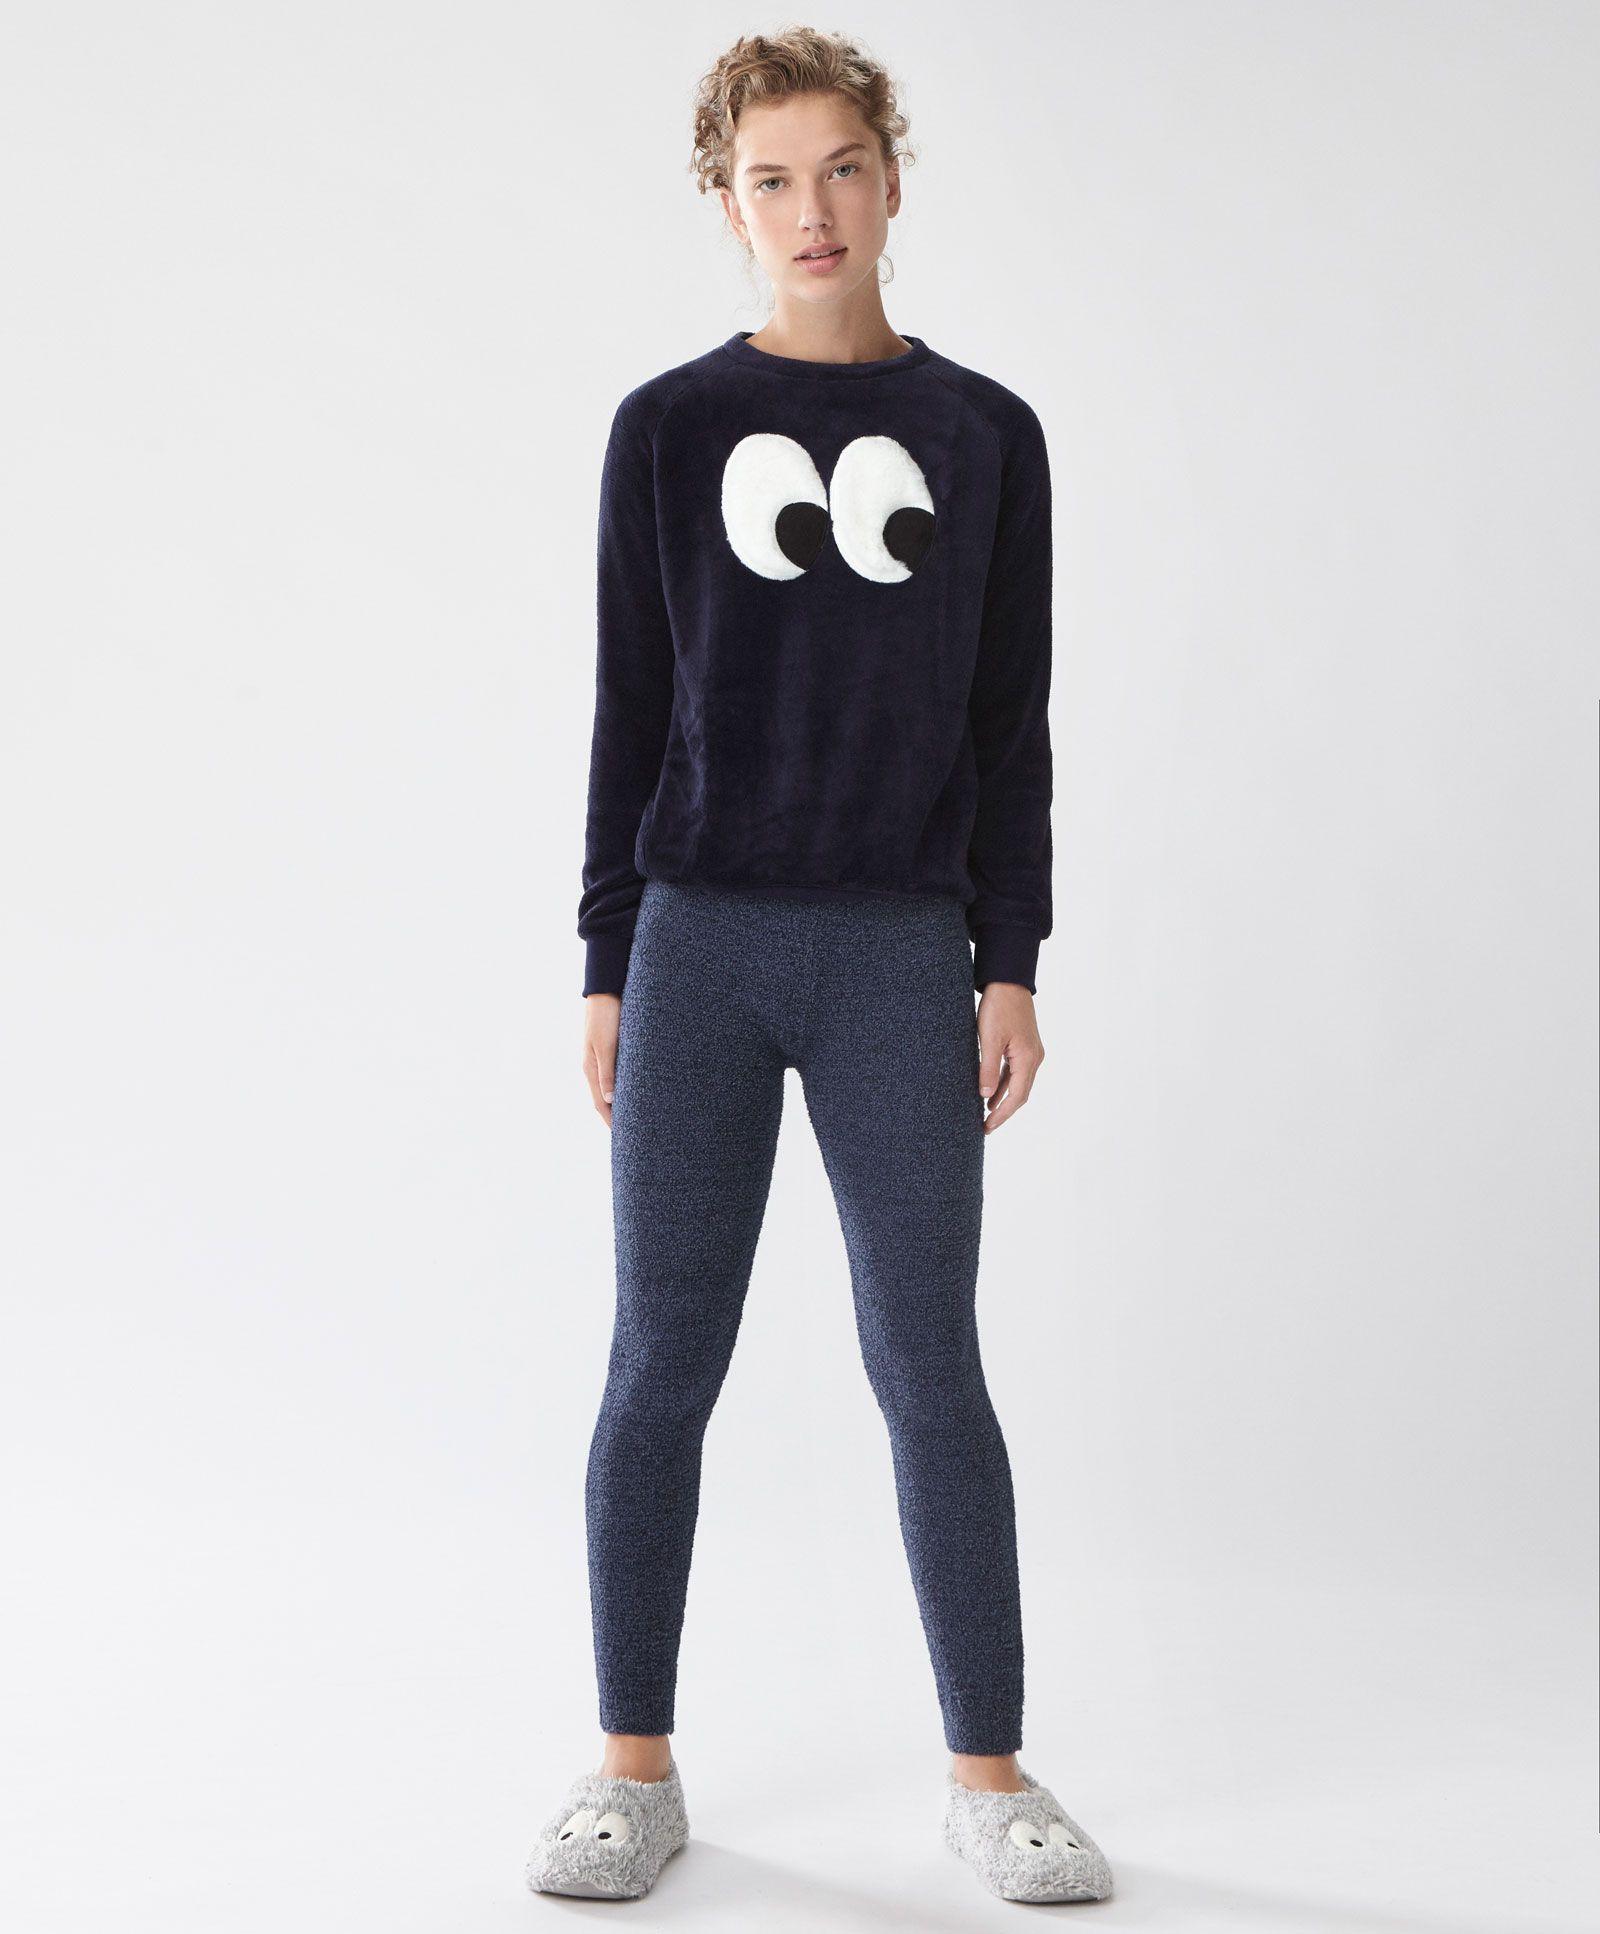 Legging fluffy bleu marine Pyjamas Polaires Derni¨res tendances